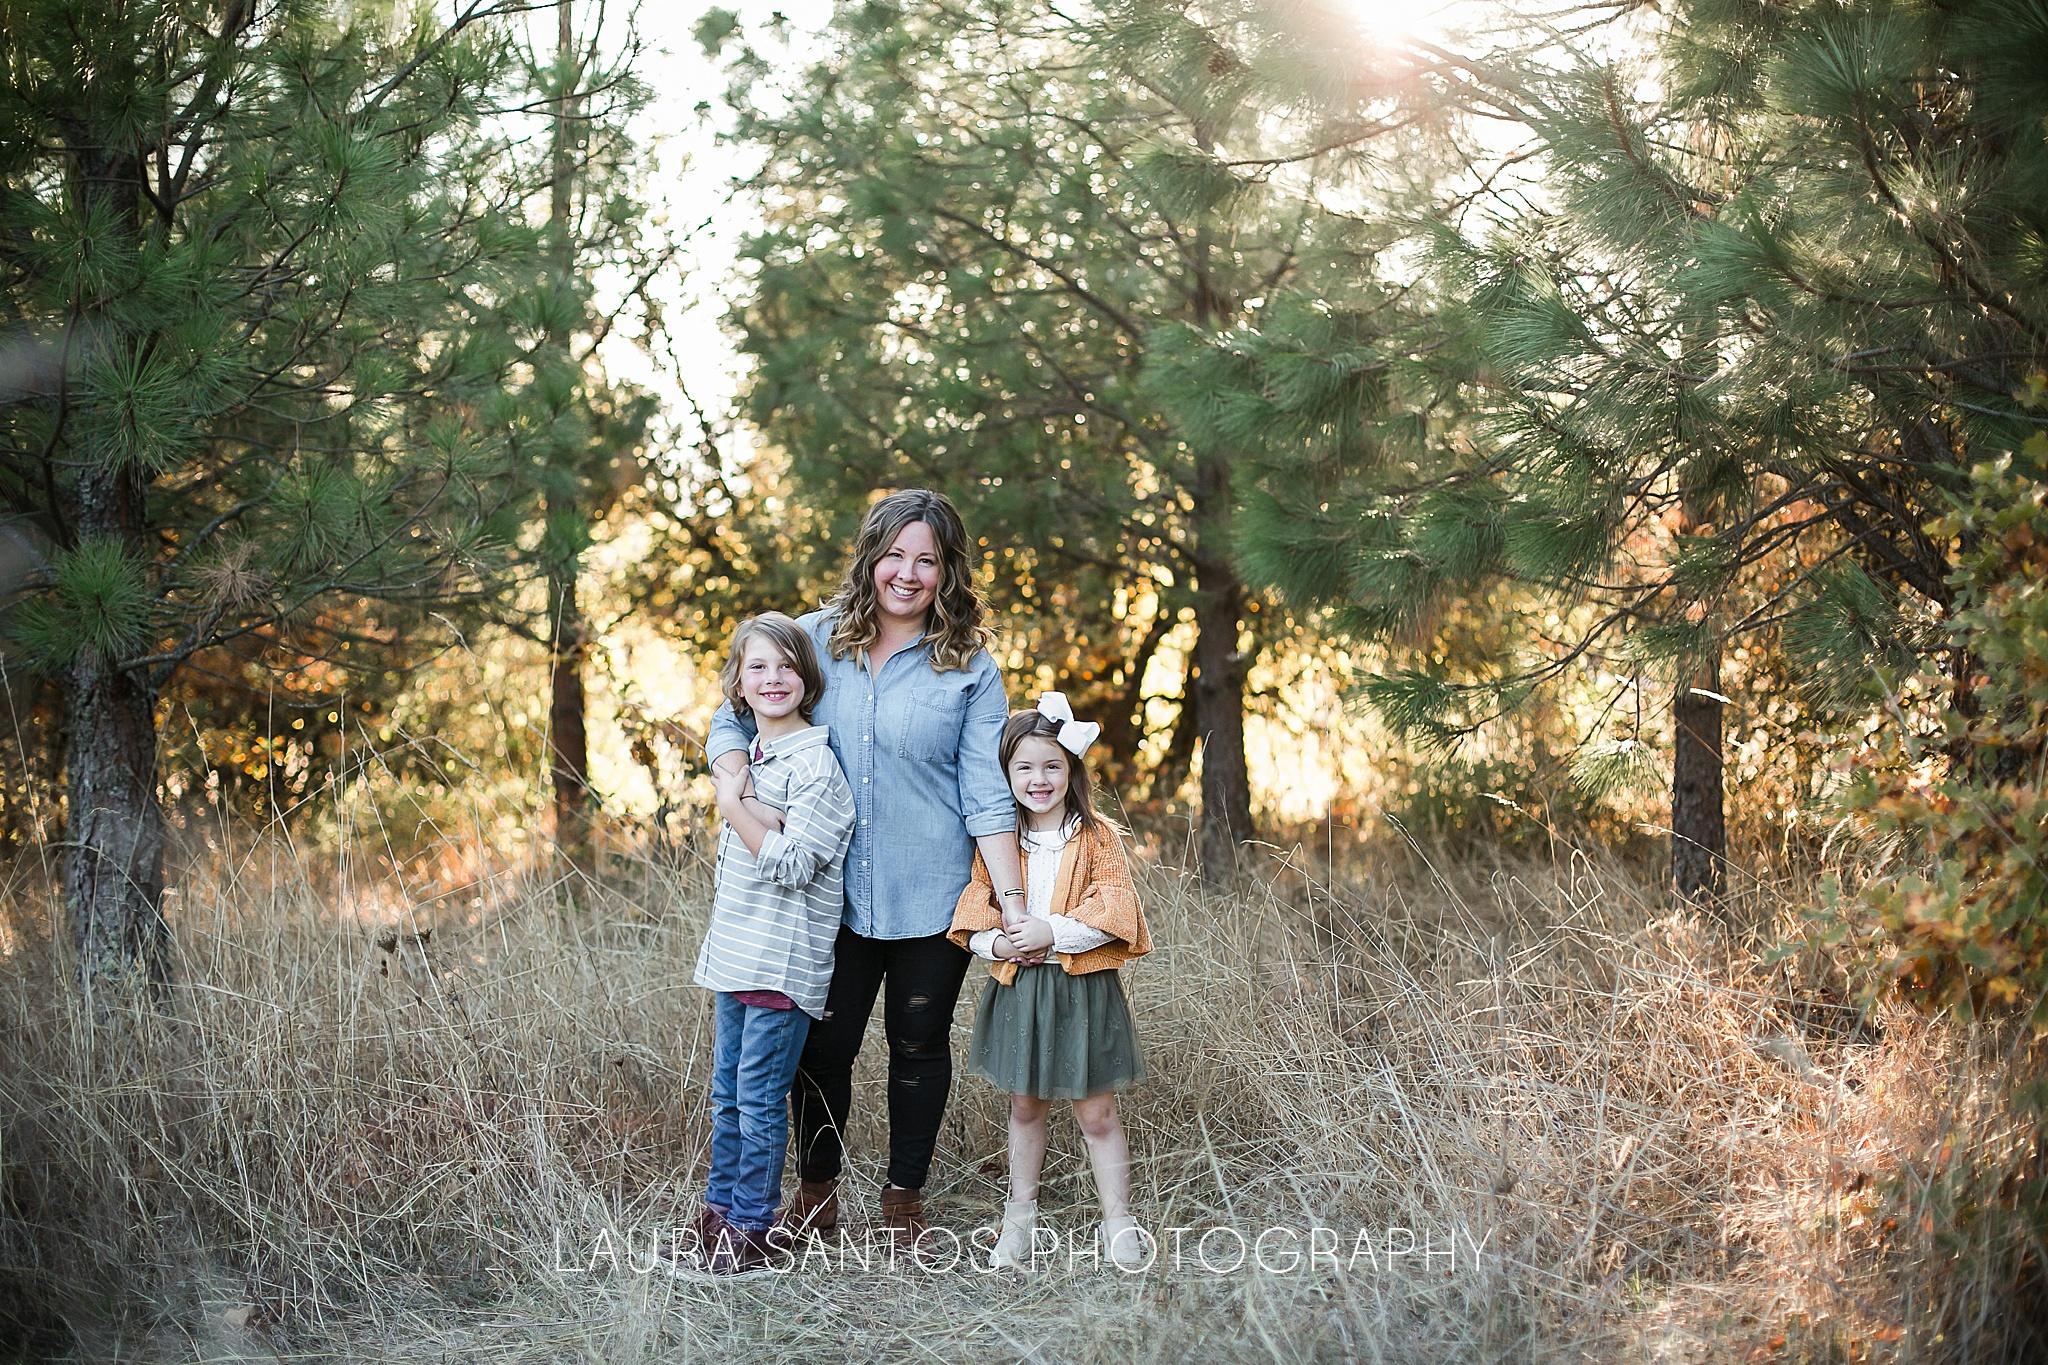 Laura Santos Photography Portland Oregon Family Photographer_0894.jpg